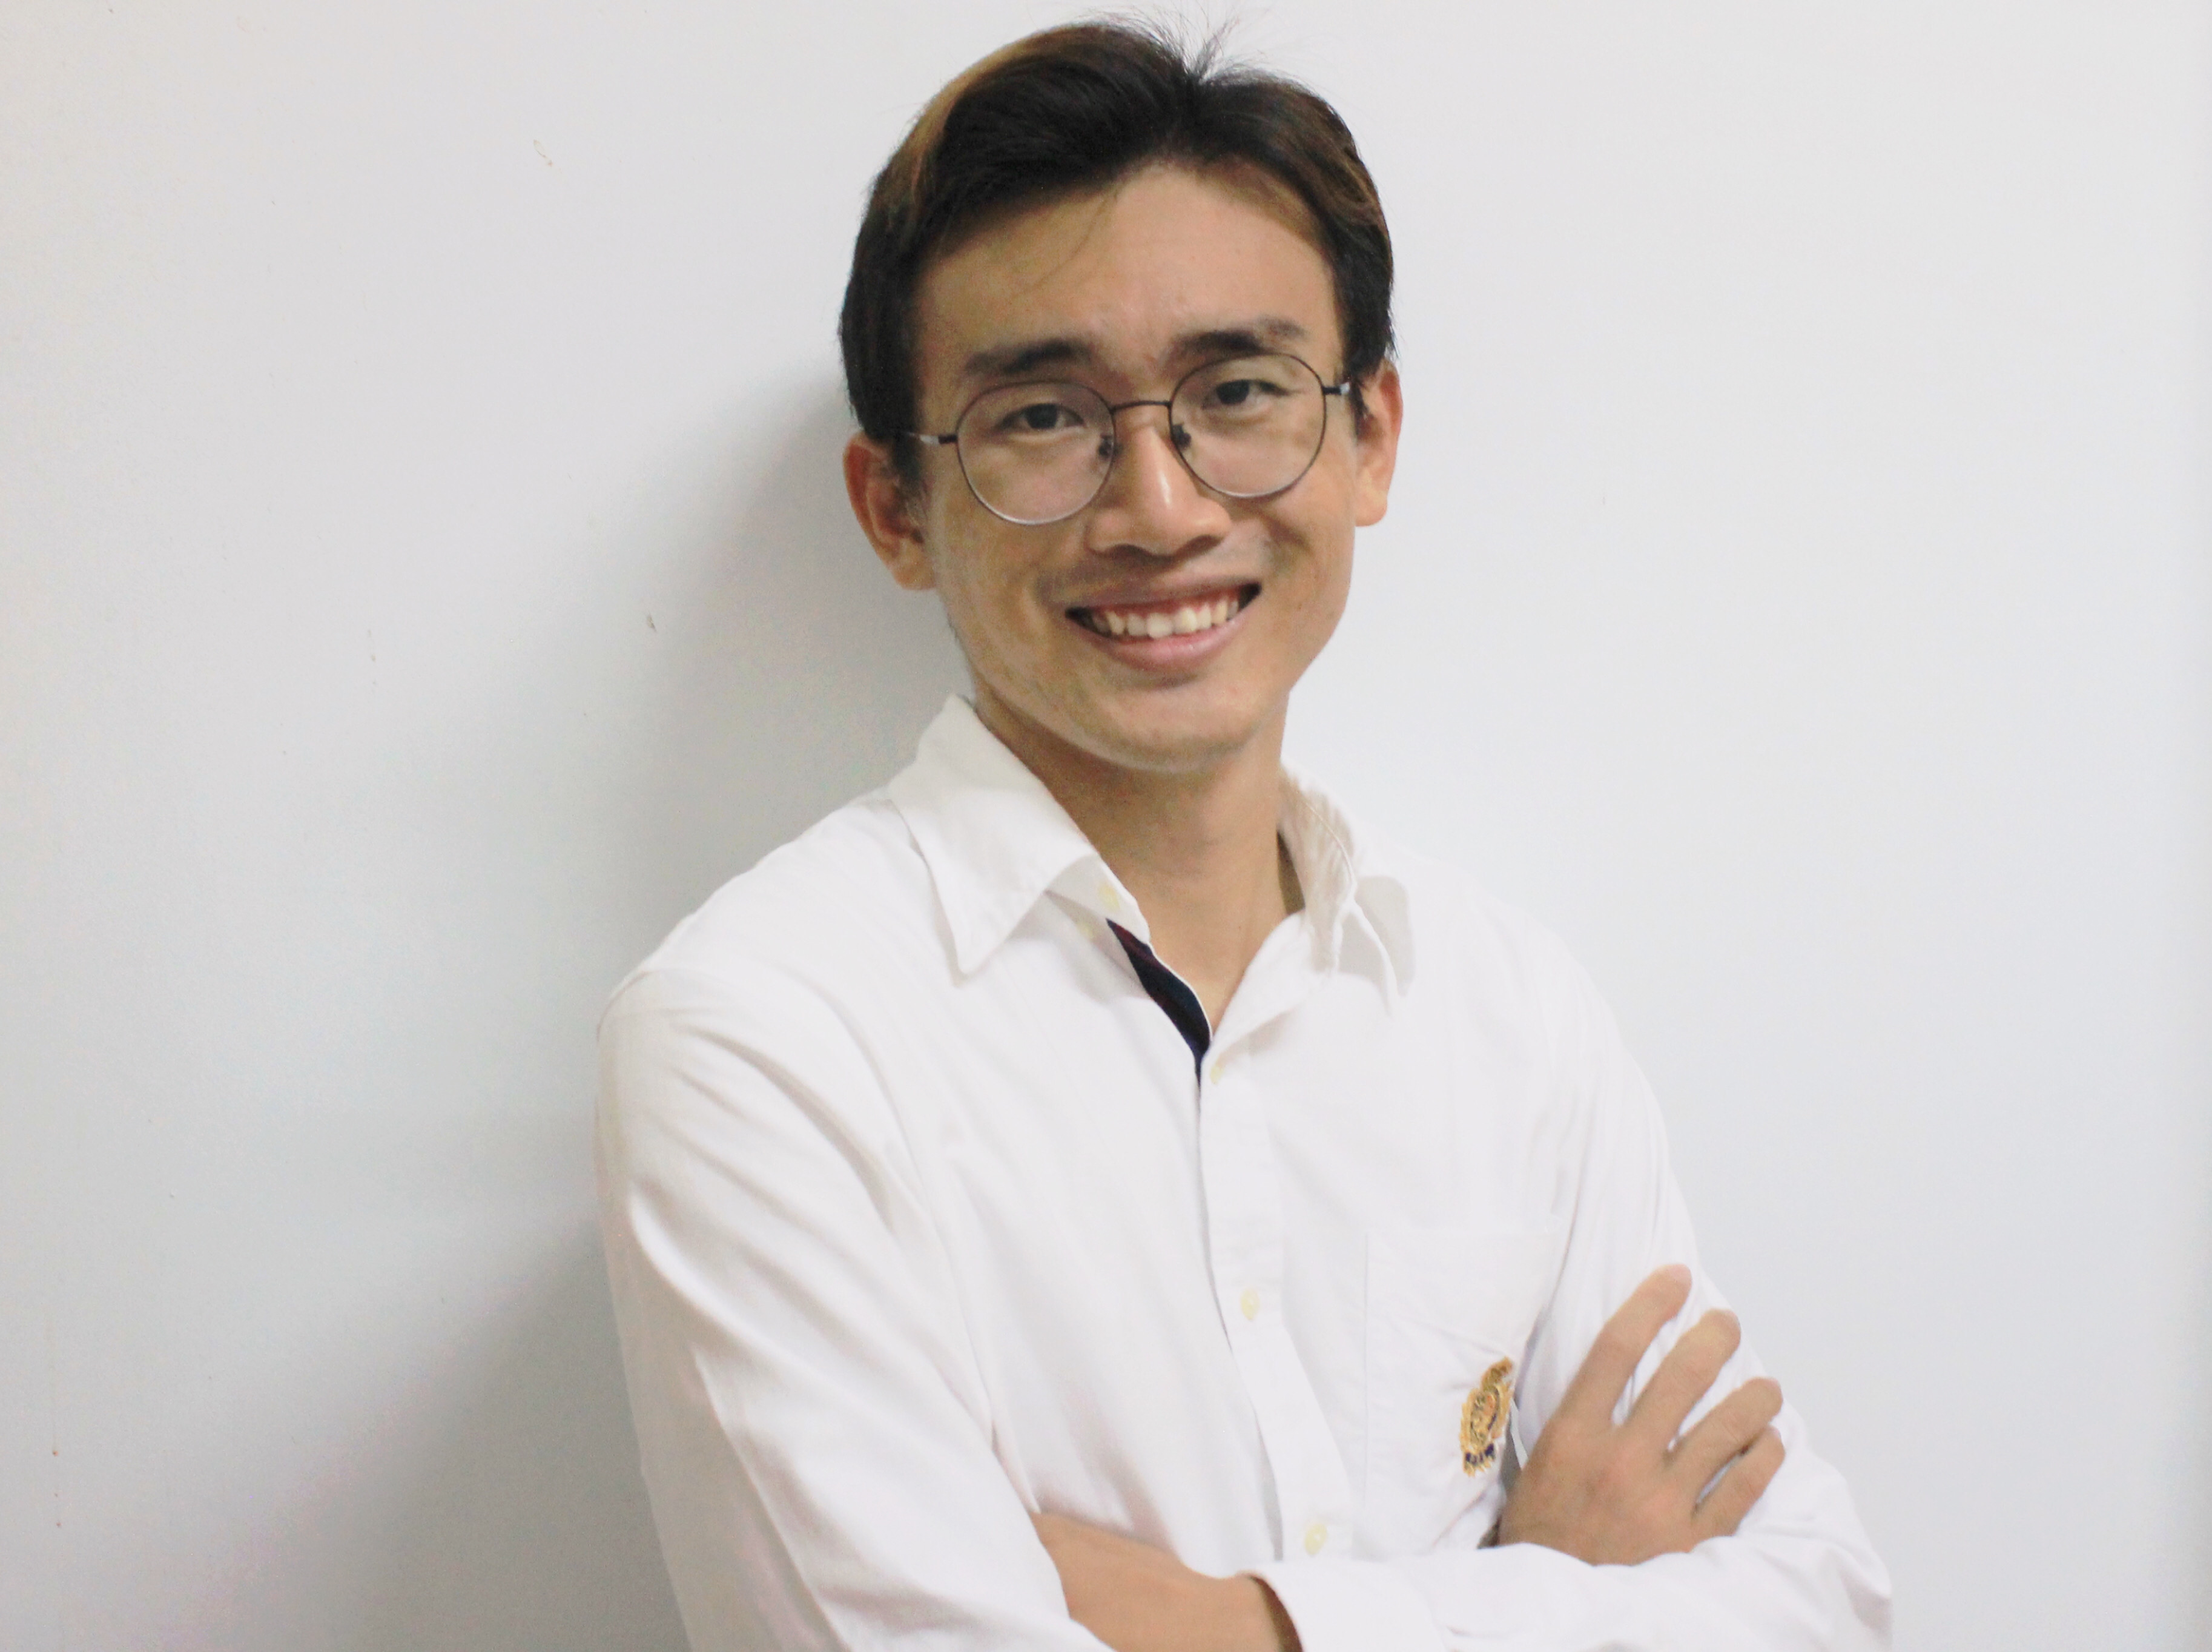 Mr Phong Thanh Nguyen